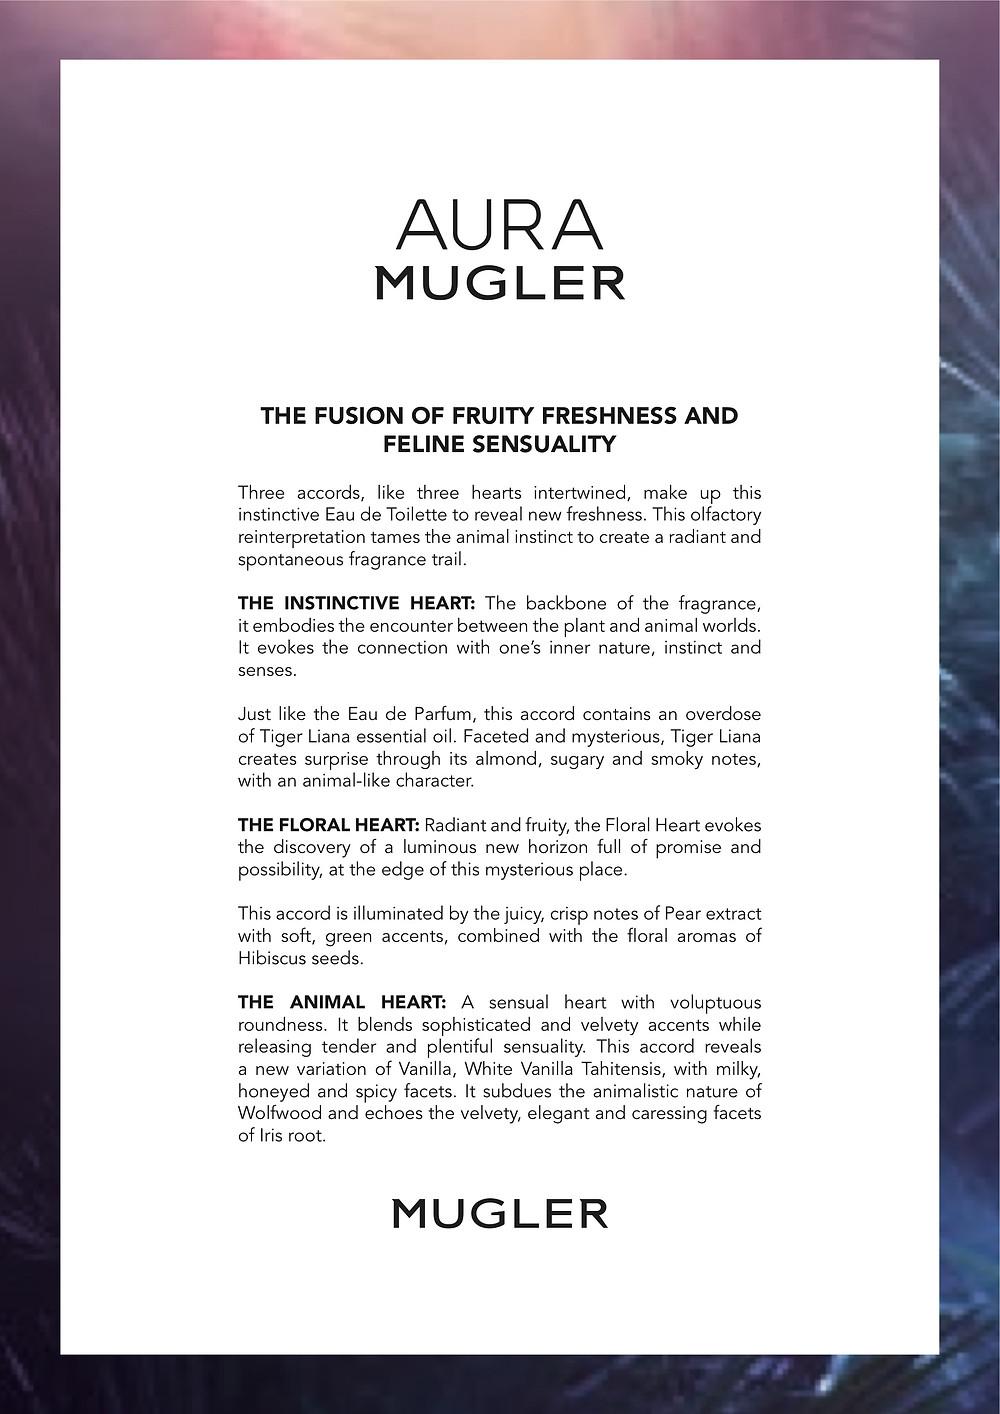 Aura Mugler, The Fusion of Fruity Freshness And Feline Sensuality | Susan Santora | Copywriter